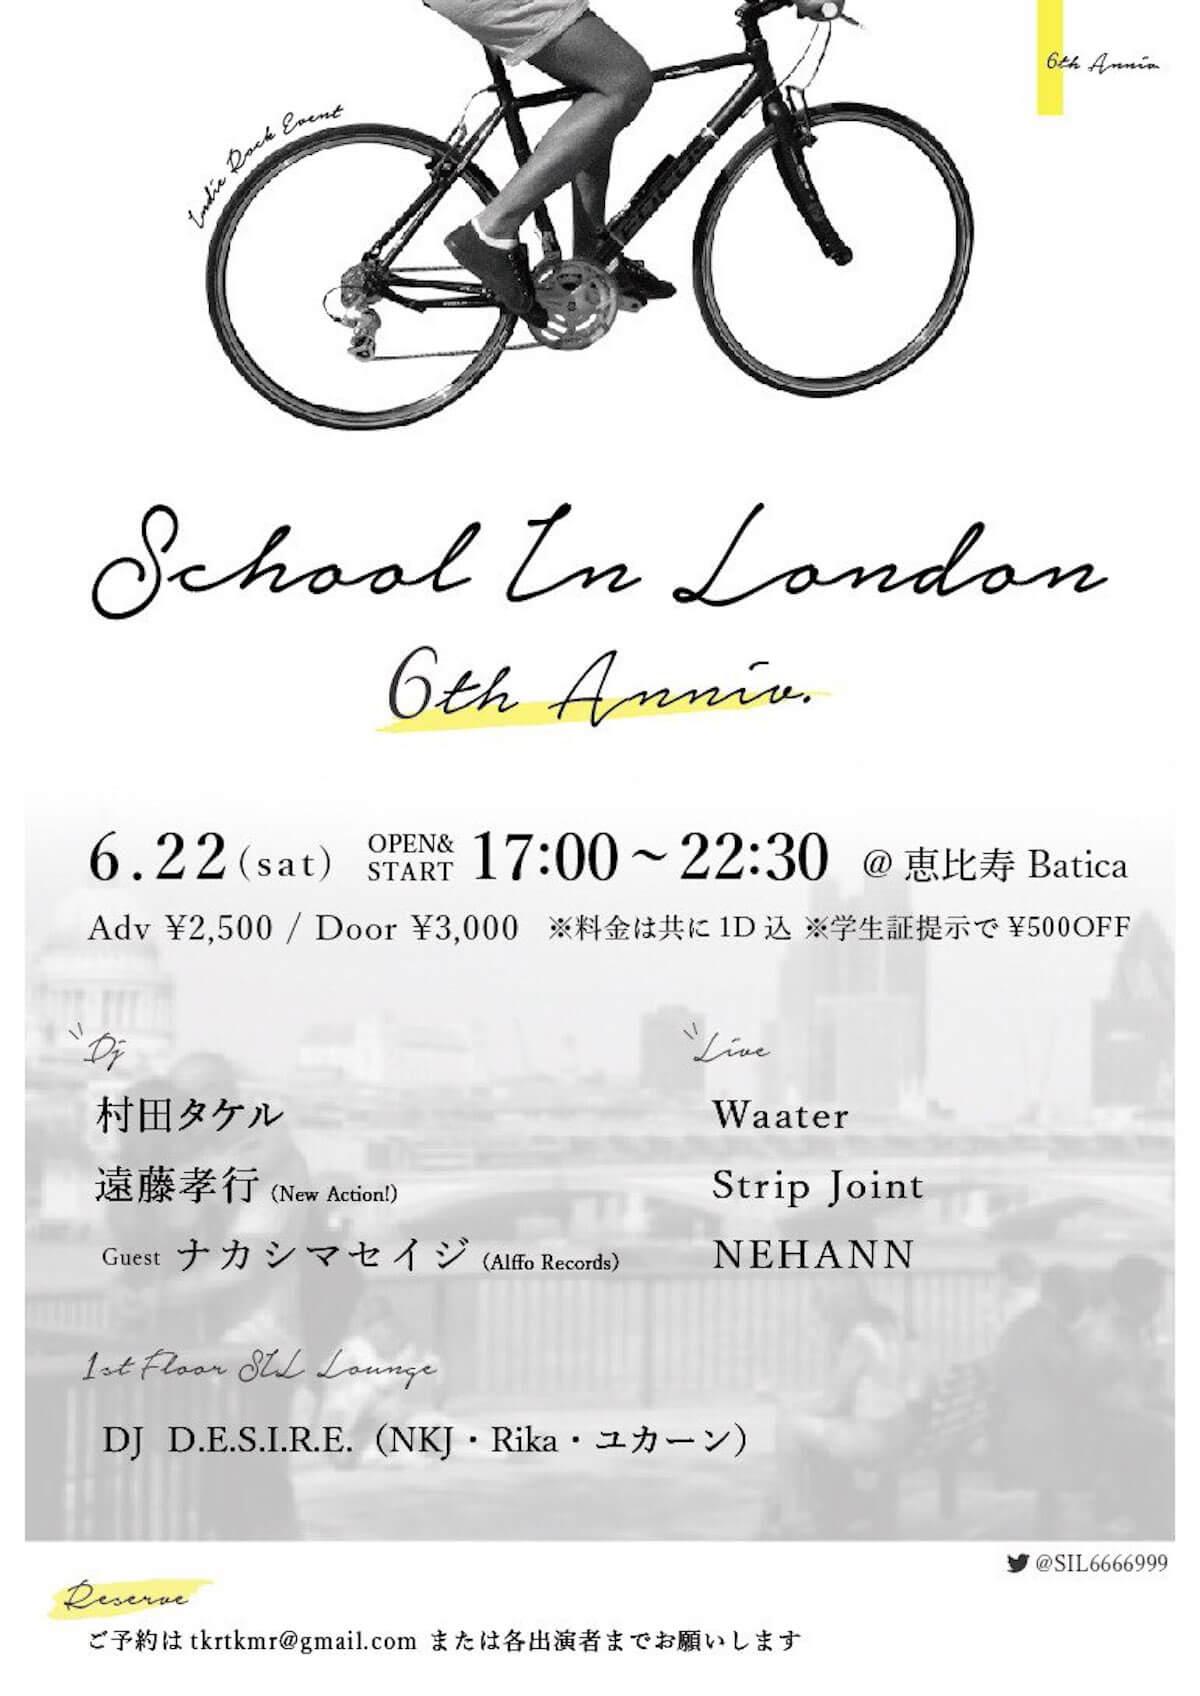 「School In London」6周年記念イベントにWaater、Strip Joint、NEHANNが登場。ゲストDJにはAlffo Recordsからナカシマセイジ music190511_schoolinlondon_1